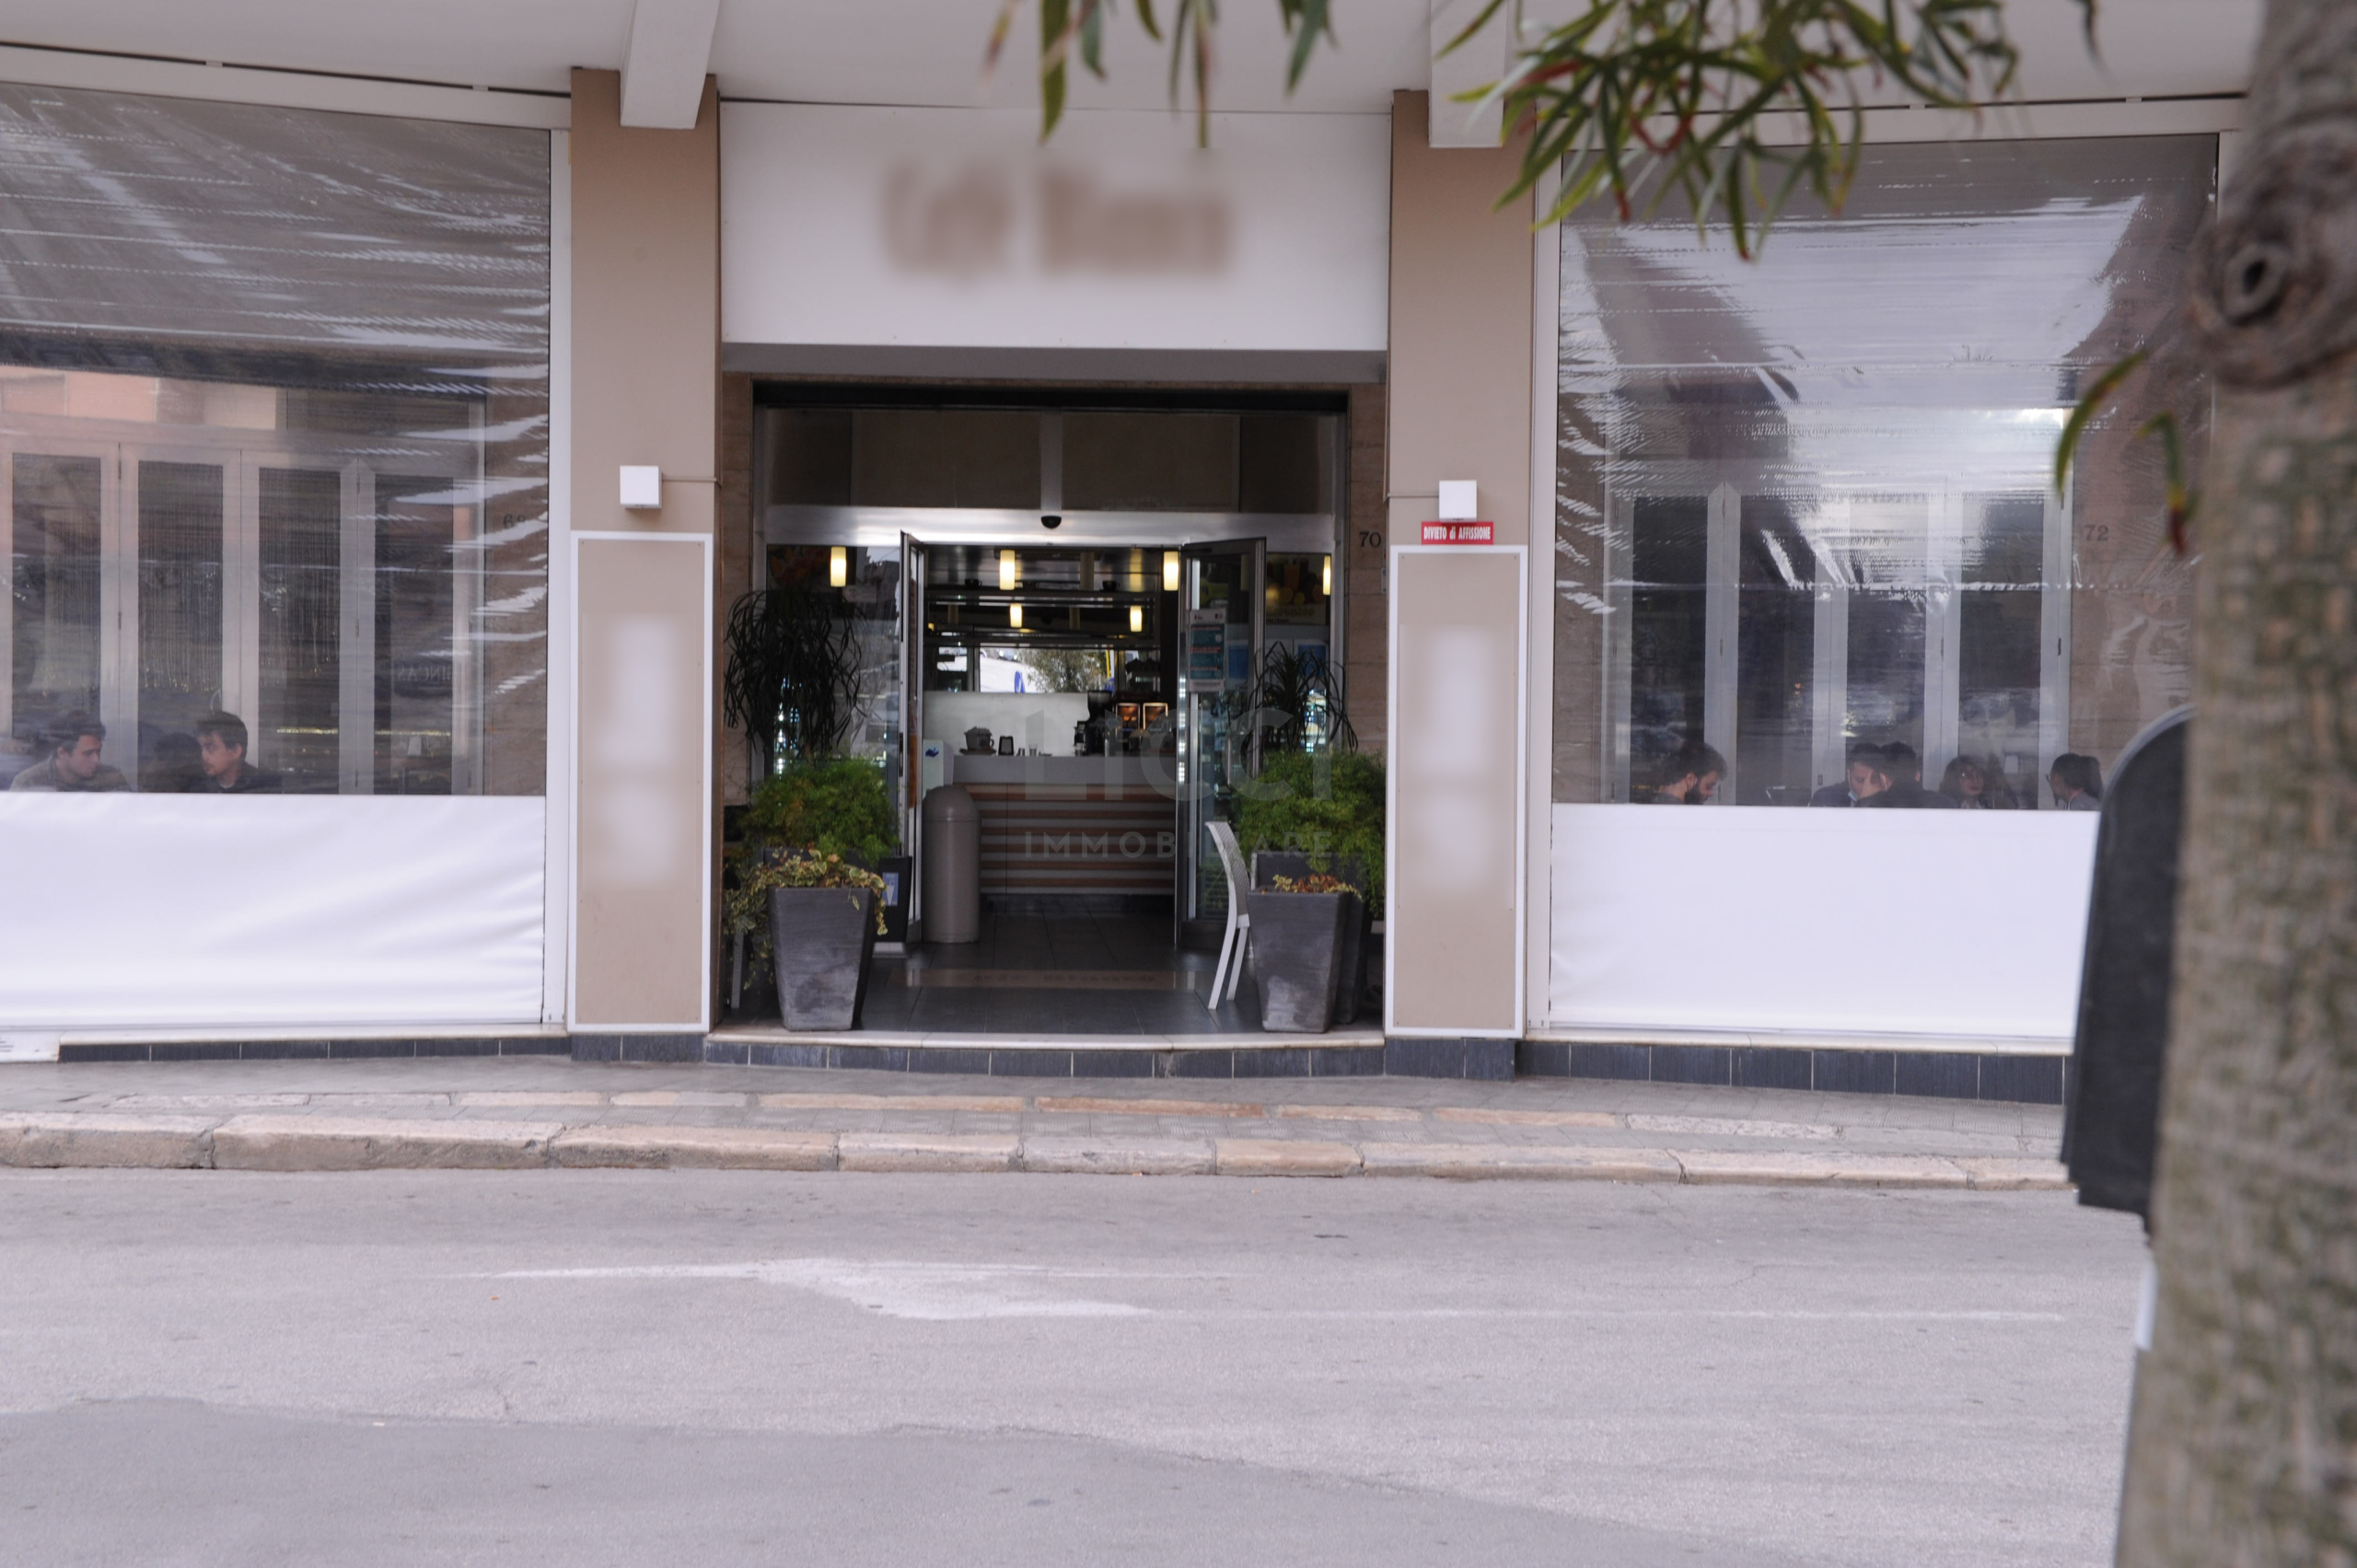 Bar Gelateria a Monopoli, Semicentrale